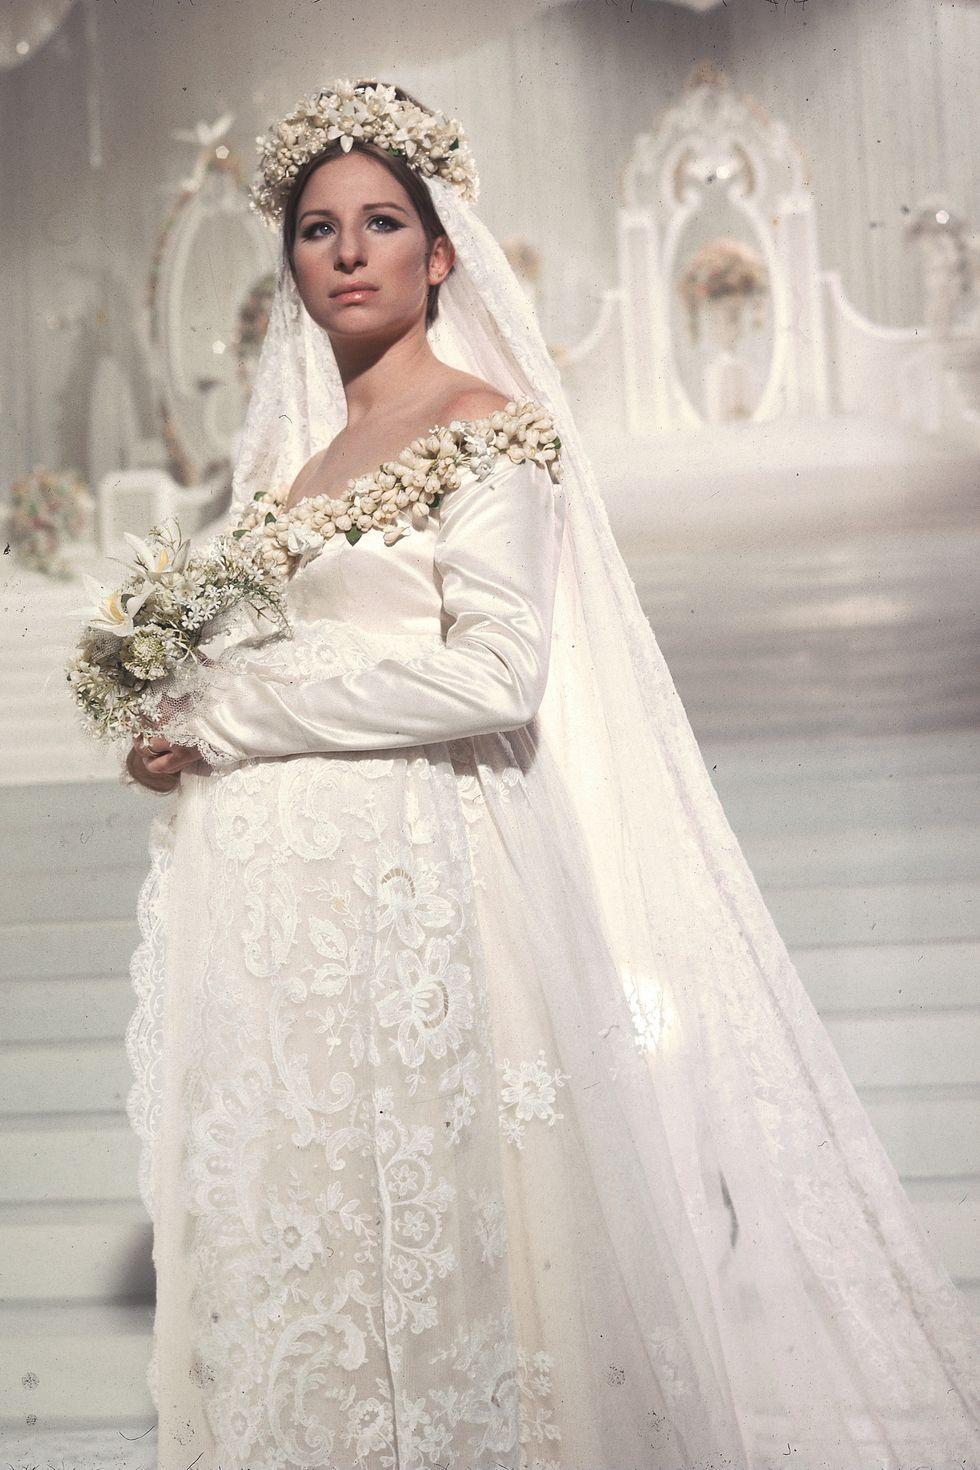 I 34 abiti da sposa più belli visti nei film